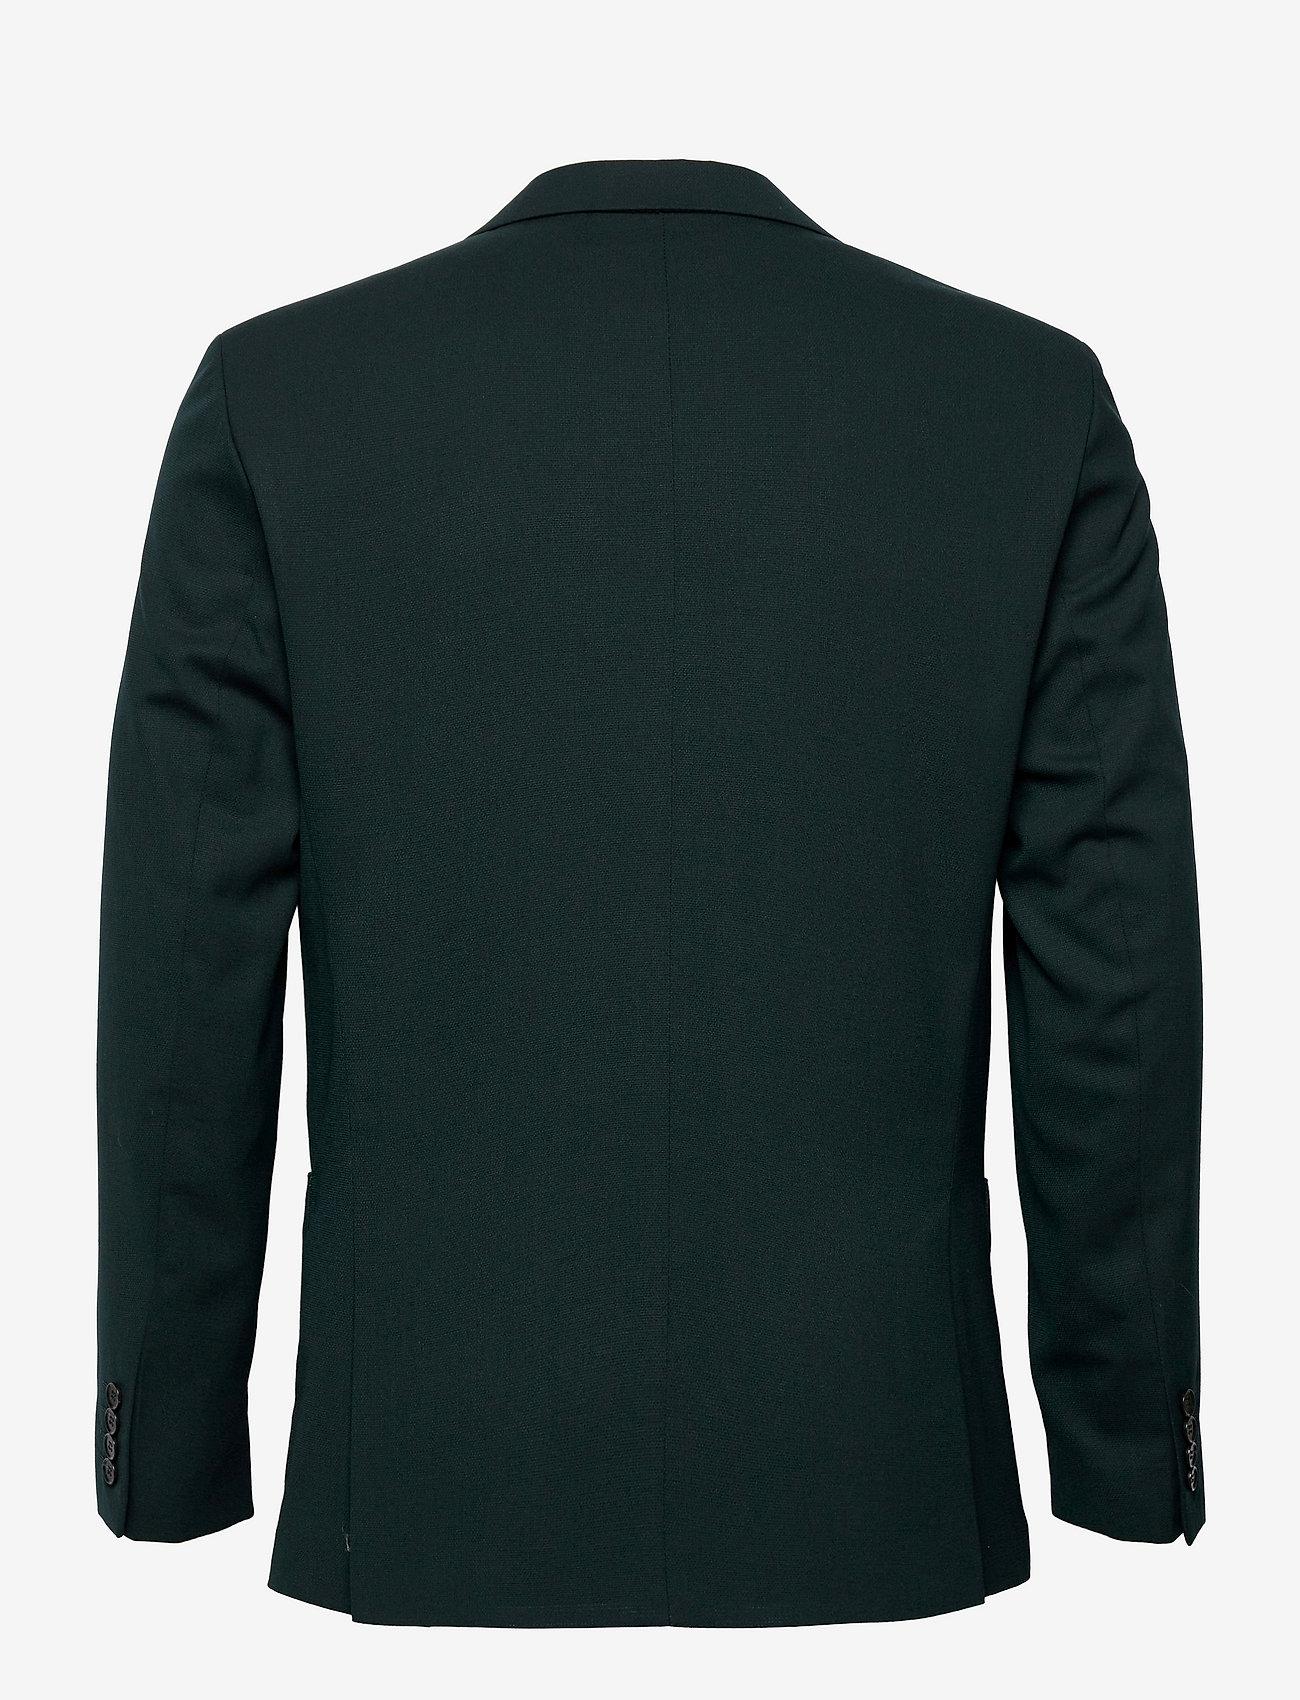 Selected Homme - SLHSLIM-JACKBILL DARK GREEN BLZ B - blazers met enkele rij knopen - dark green - 1